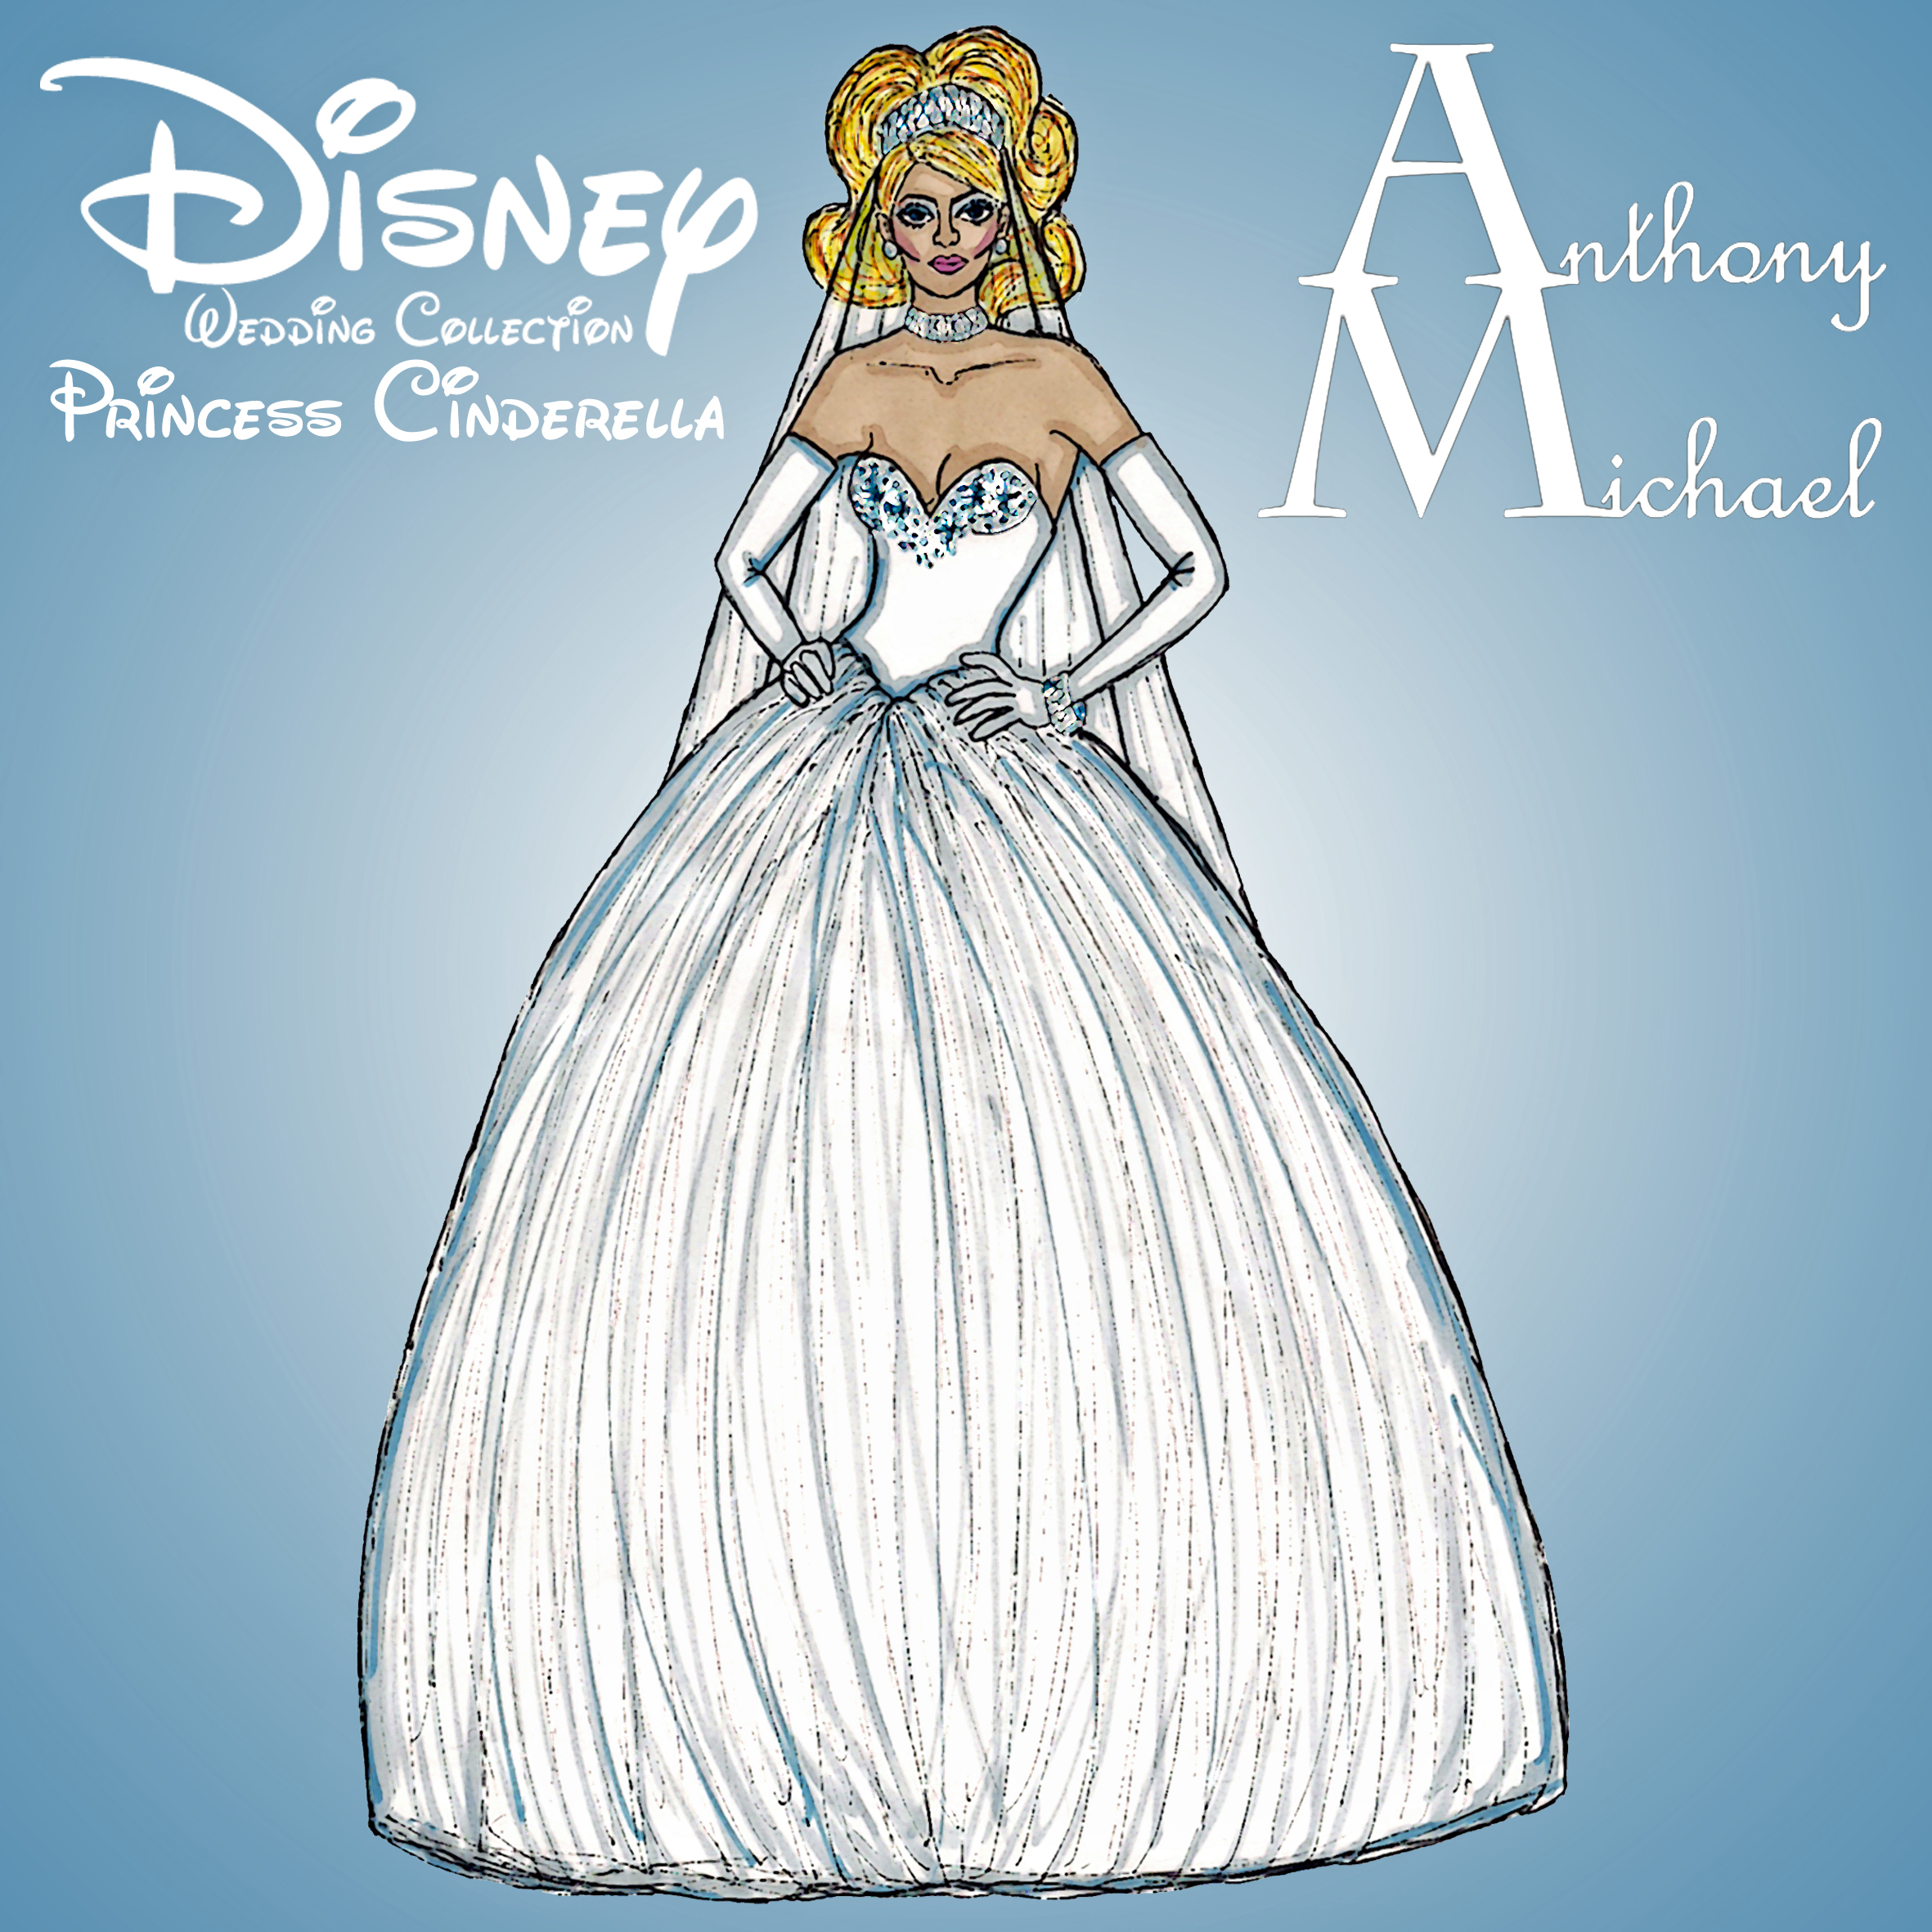 Cinderella Wedding Dress cinderella wedding dresses Cinderella Wedding Dress by Anthl Cinderella Wedding Dress by Anthl